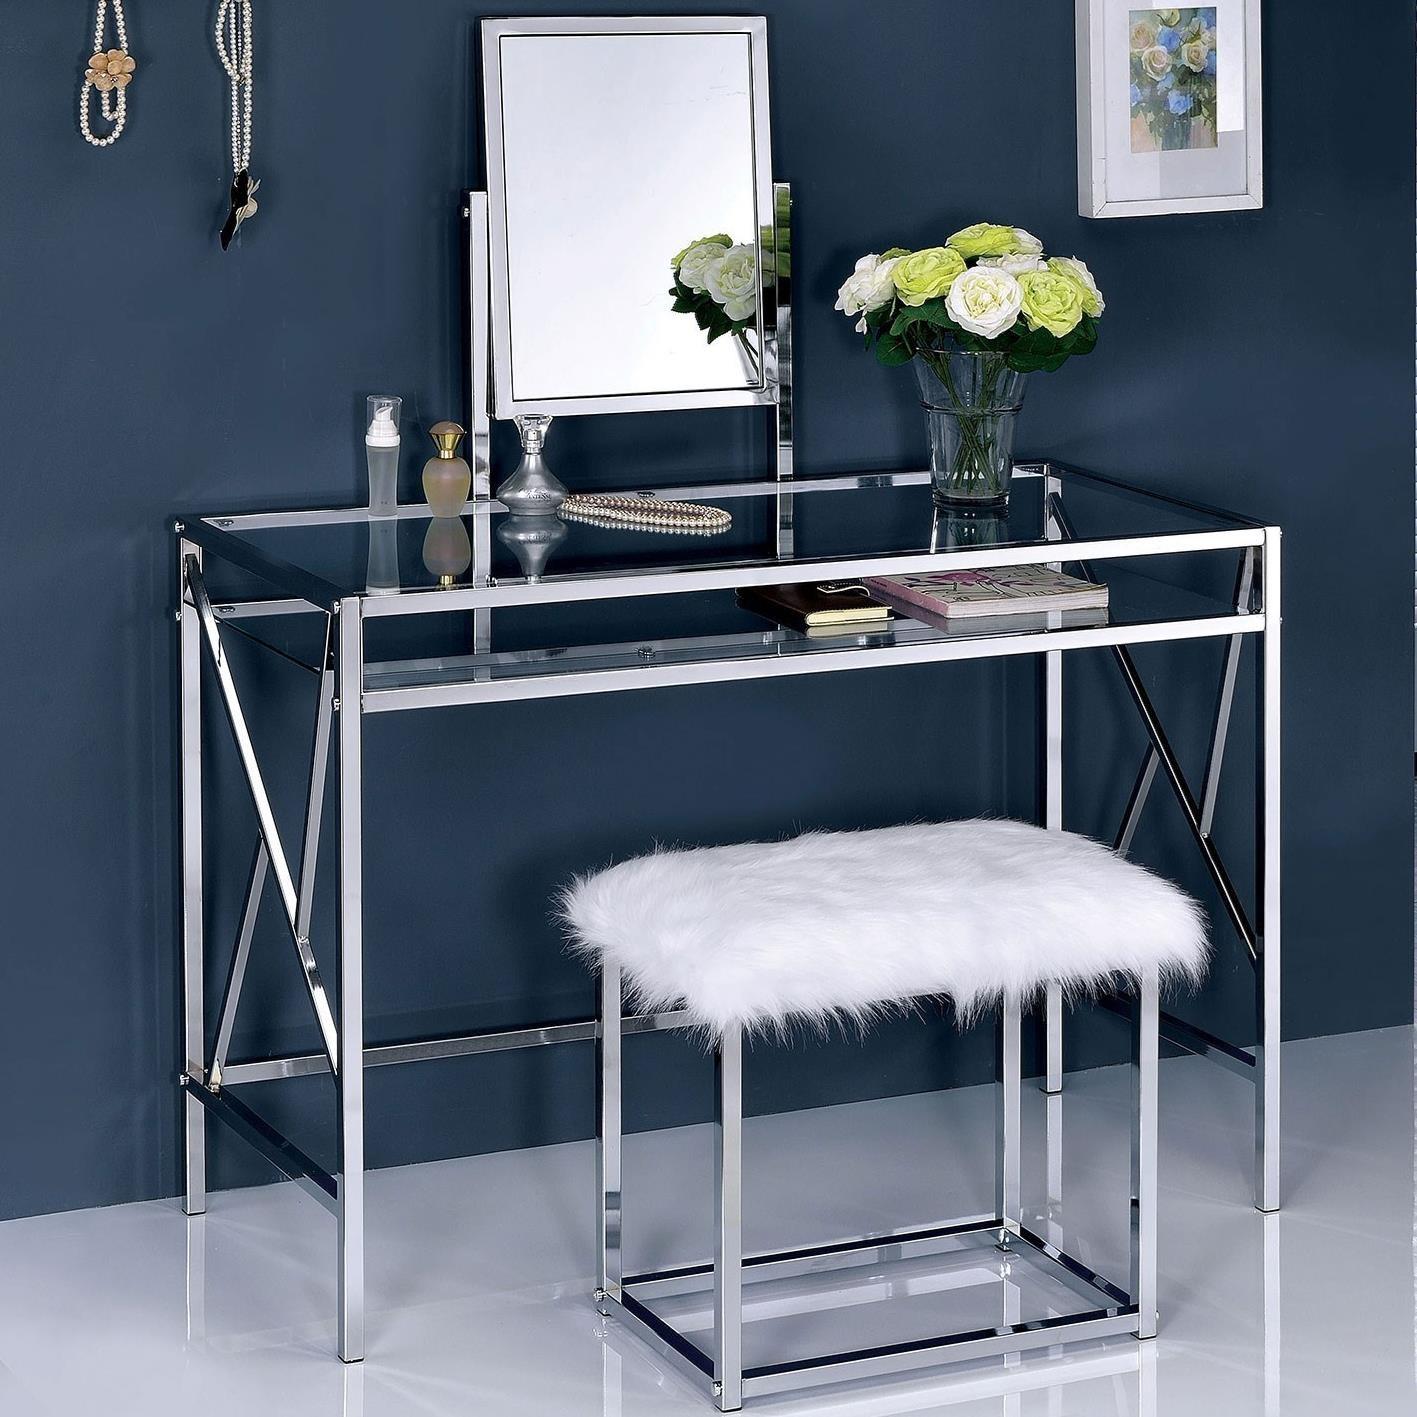 Furniture Of America Foa Lismore Cm Dk6707crm Glam Makeup Vanity Table With Glass Top And Faux Fur Stool Del Sol Furniture Vanities Vanity Sets